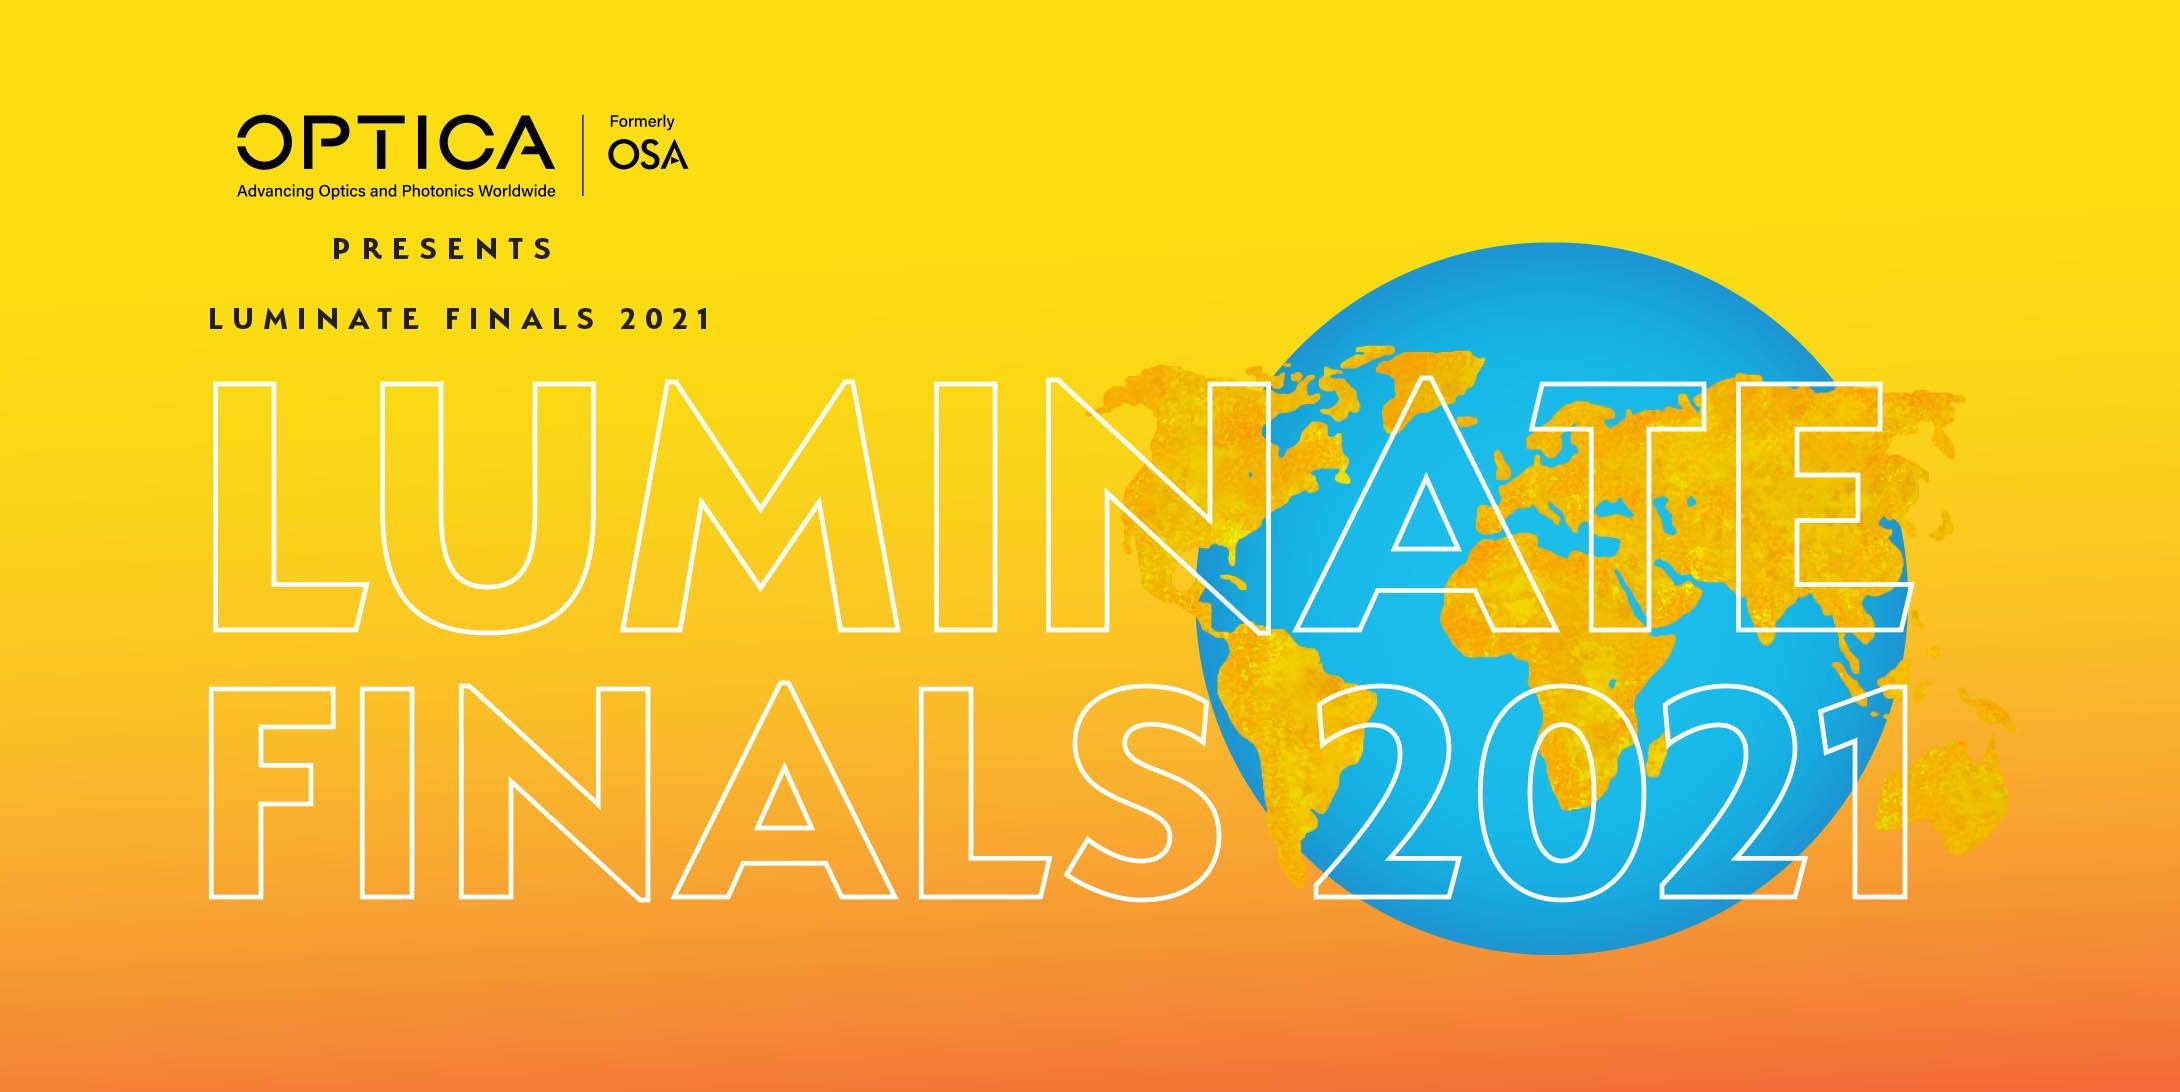 Luminate Finals 2021